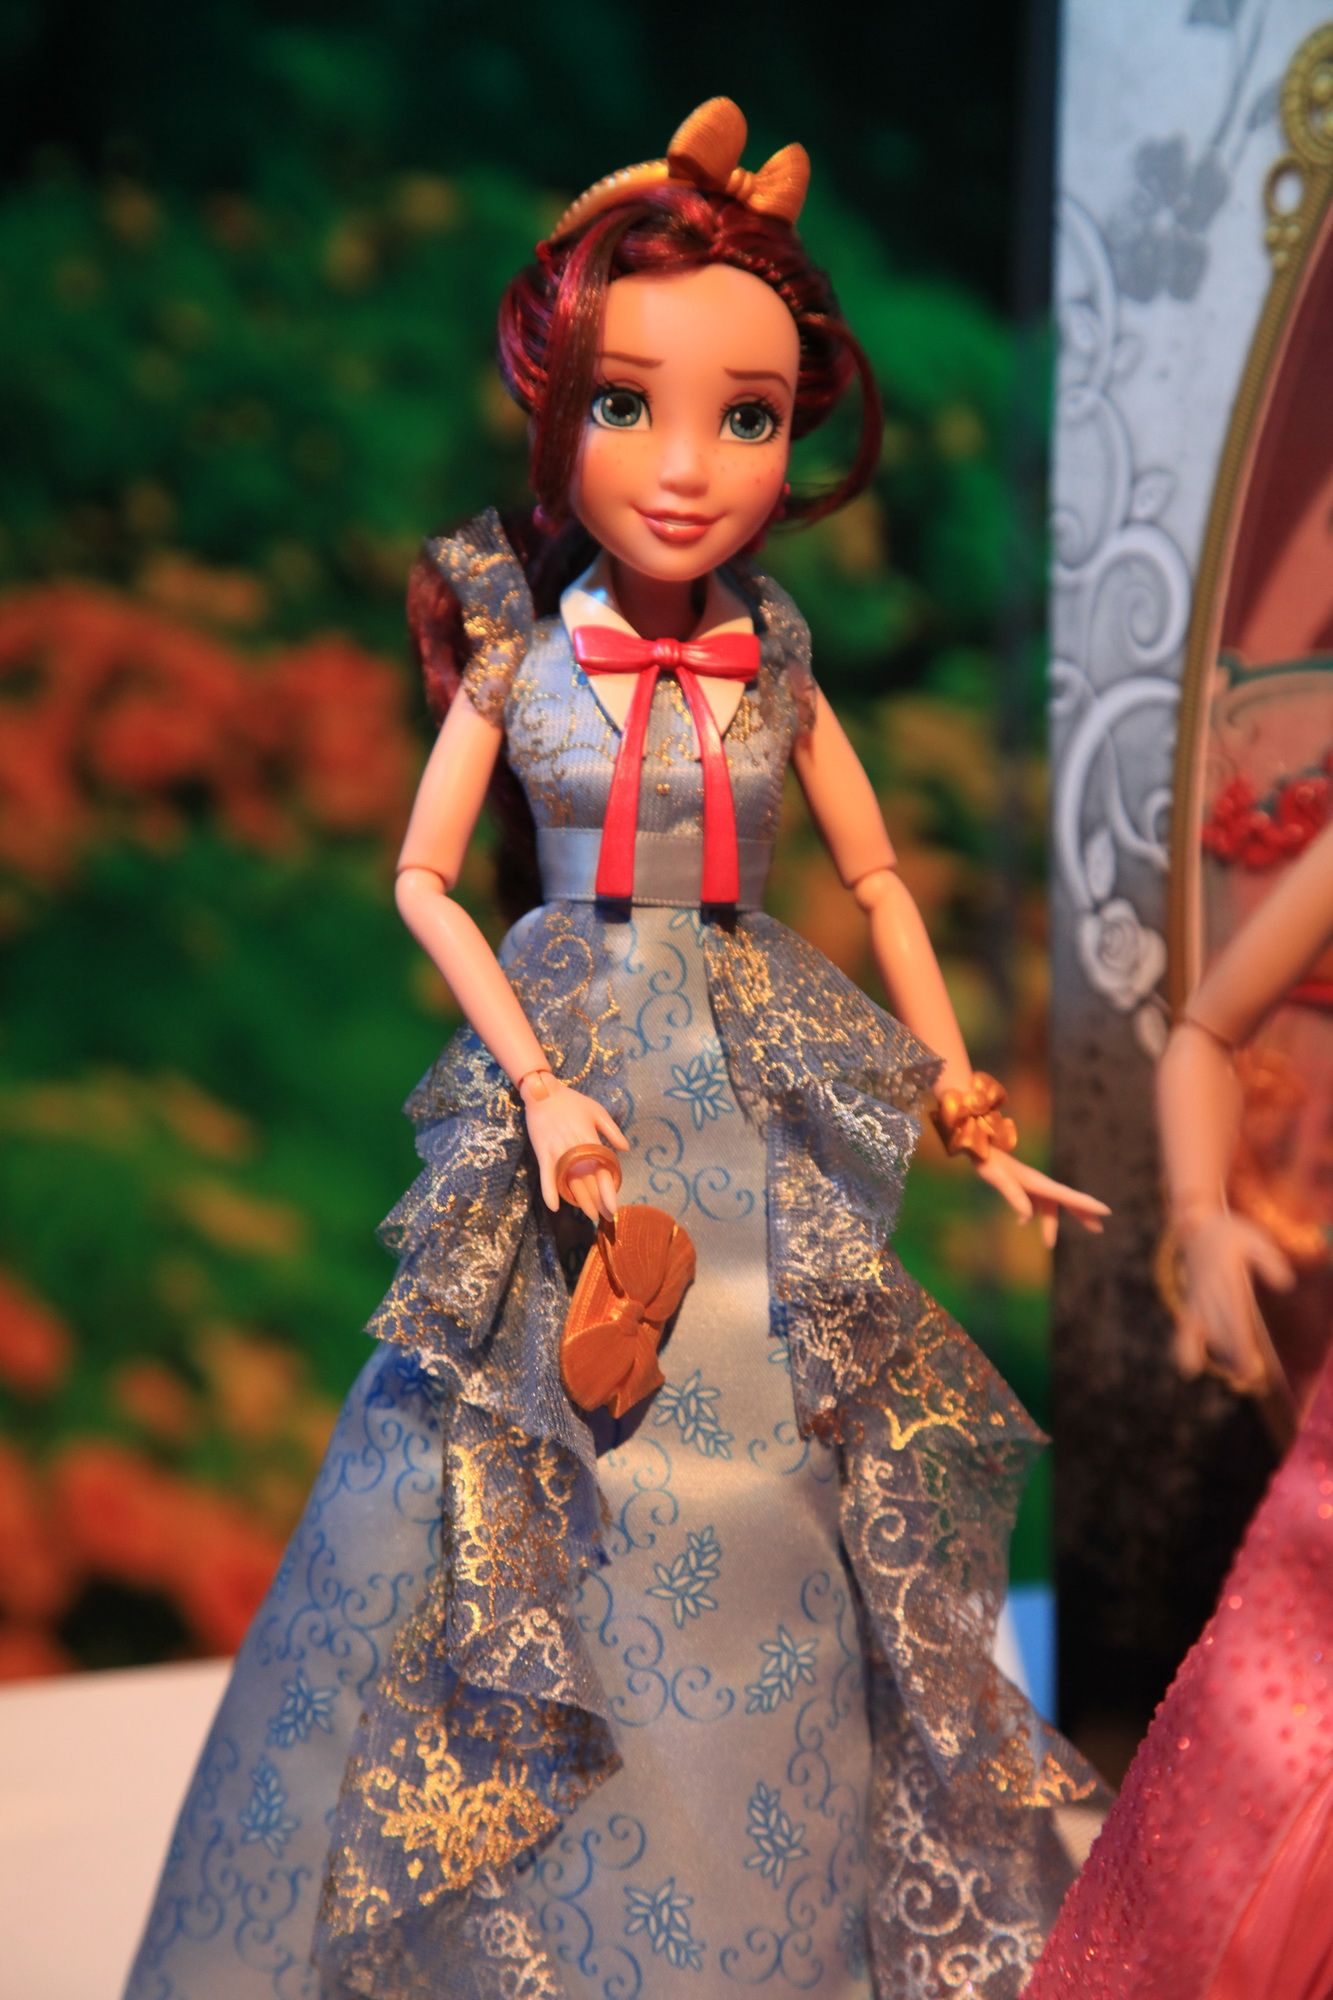 Disney Descendants Jane Daughter Of The Fairy Godmother In Her Coronation Dress Doll By Hasbro 2015 Disney Descendants Dolls Disney Decendants Disney Descendants